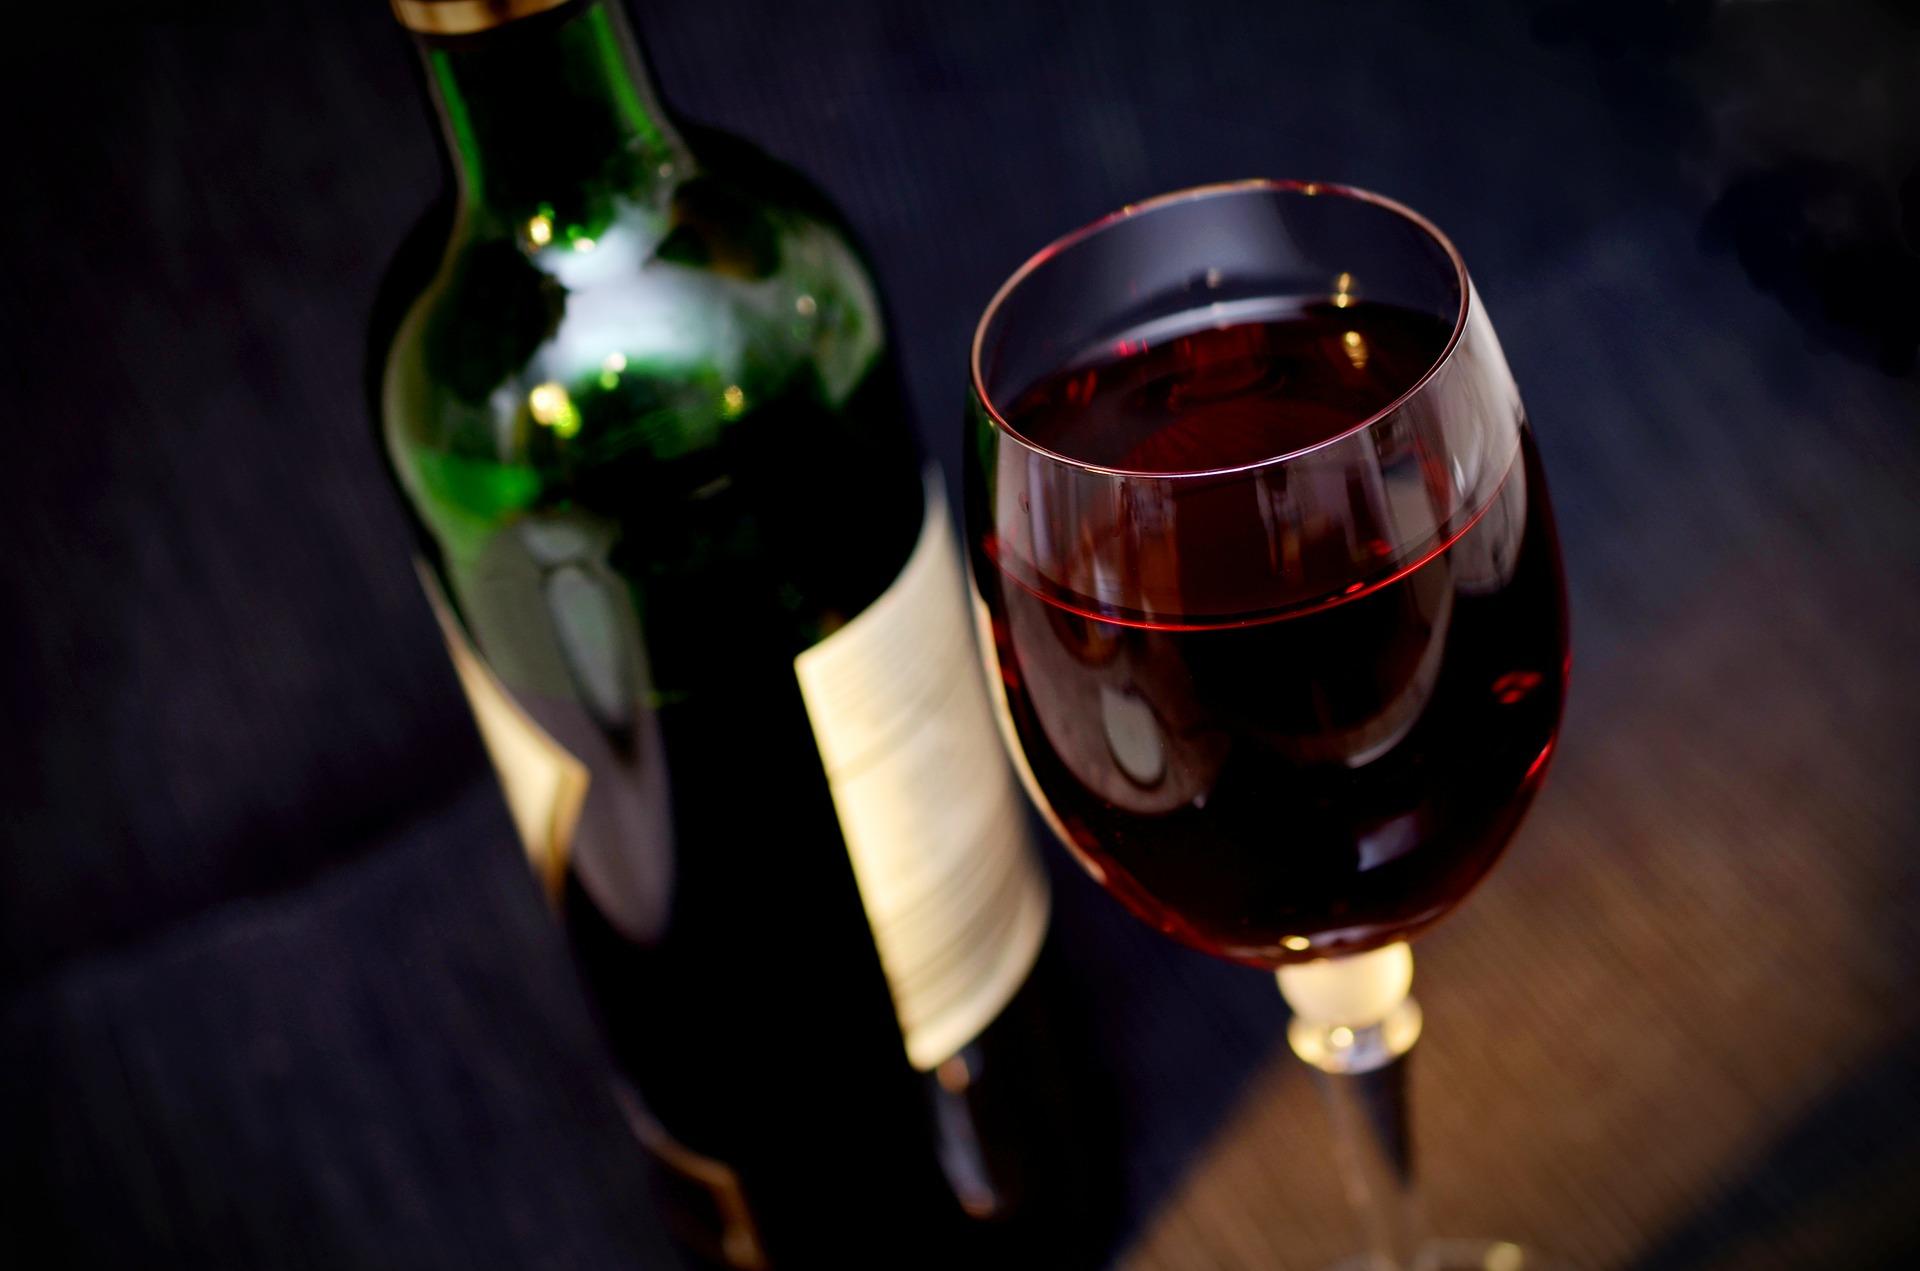 wine-541922_1920_1556674545020.jpg